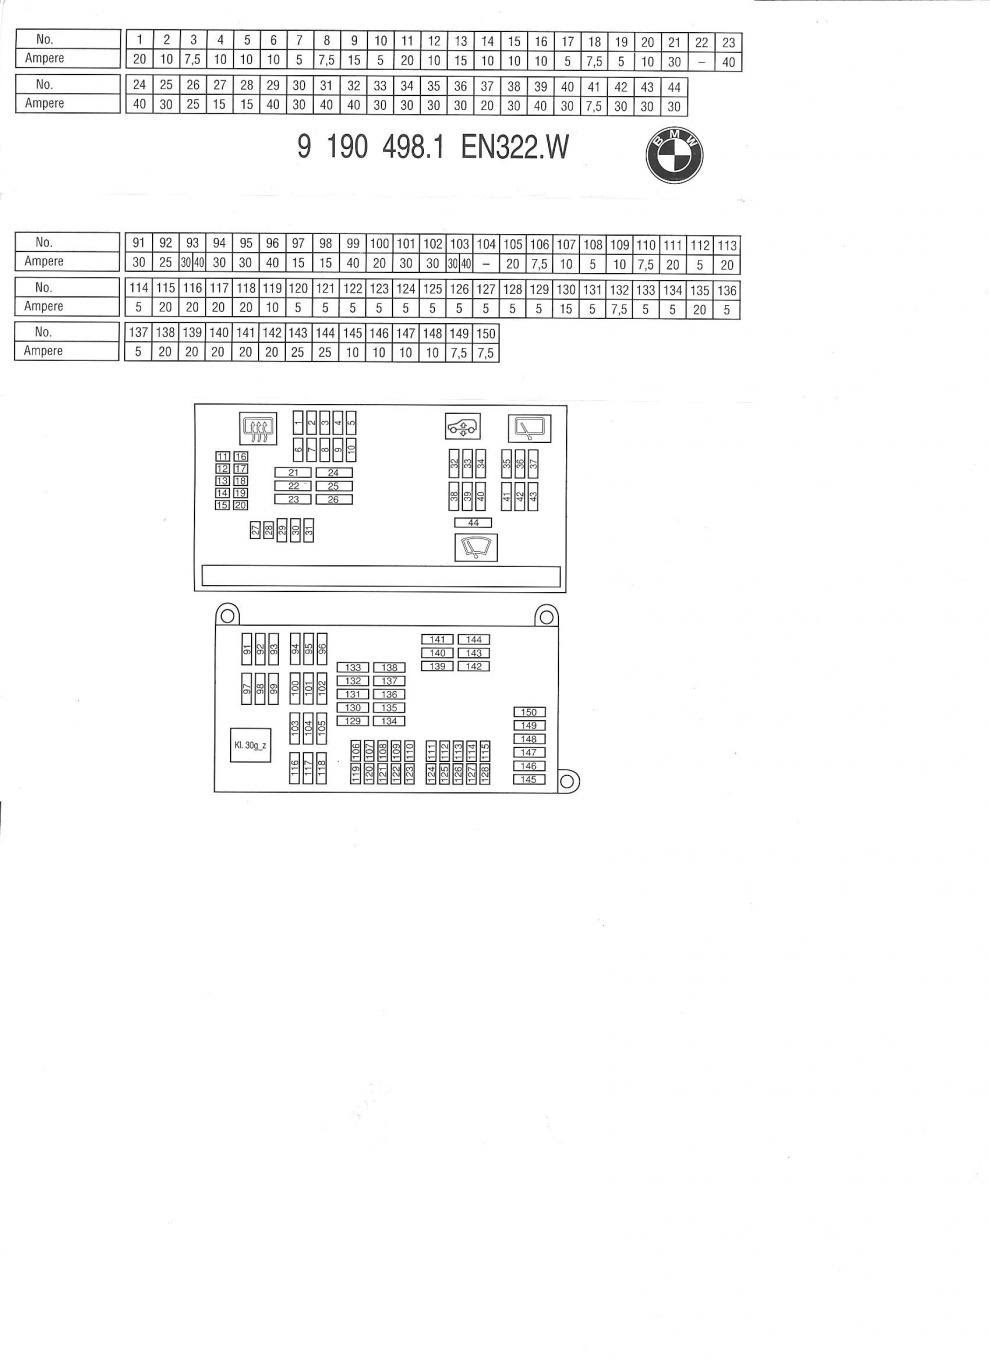 Diagram 2005 Bmw X3 Fuse Diagram Full Version Hd Quality Fuse Diagram Lori Diagram Editions Delpierre Fr